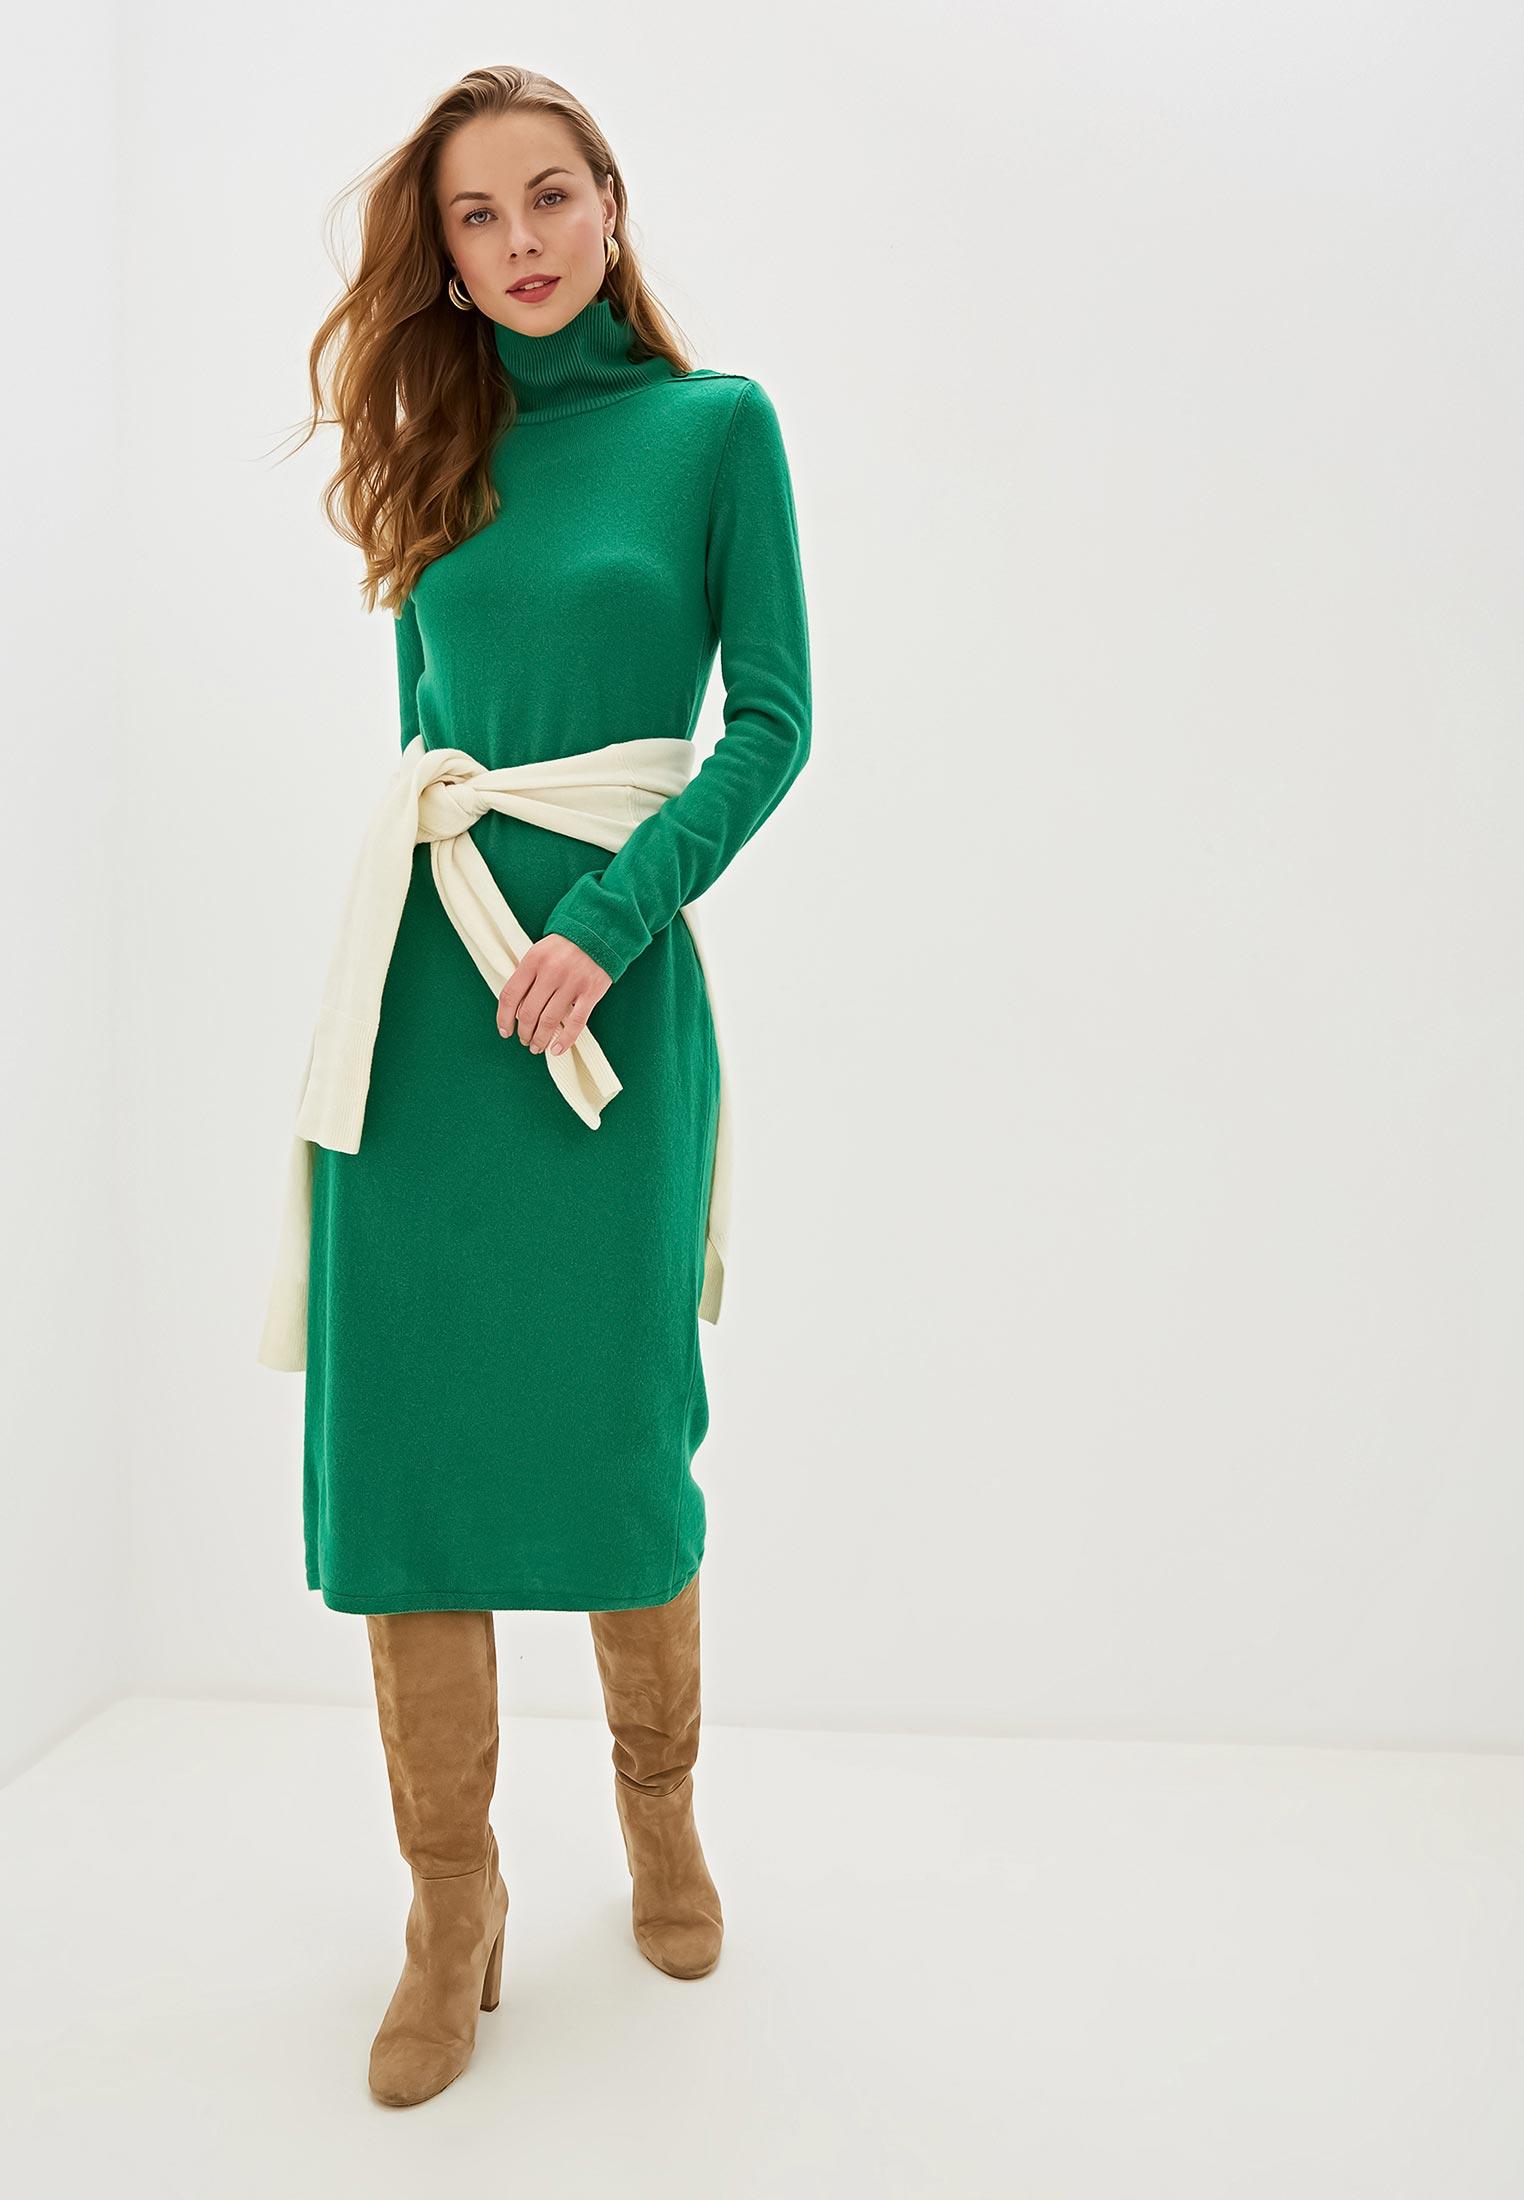 Вязаное платье United Colors of Benetton (Юнайтед Колорс оф Бенеттон) 1044V2417